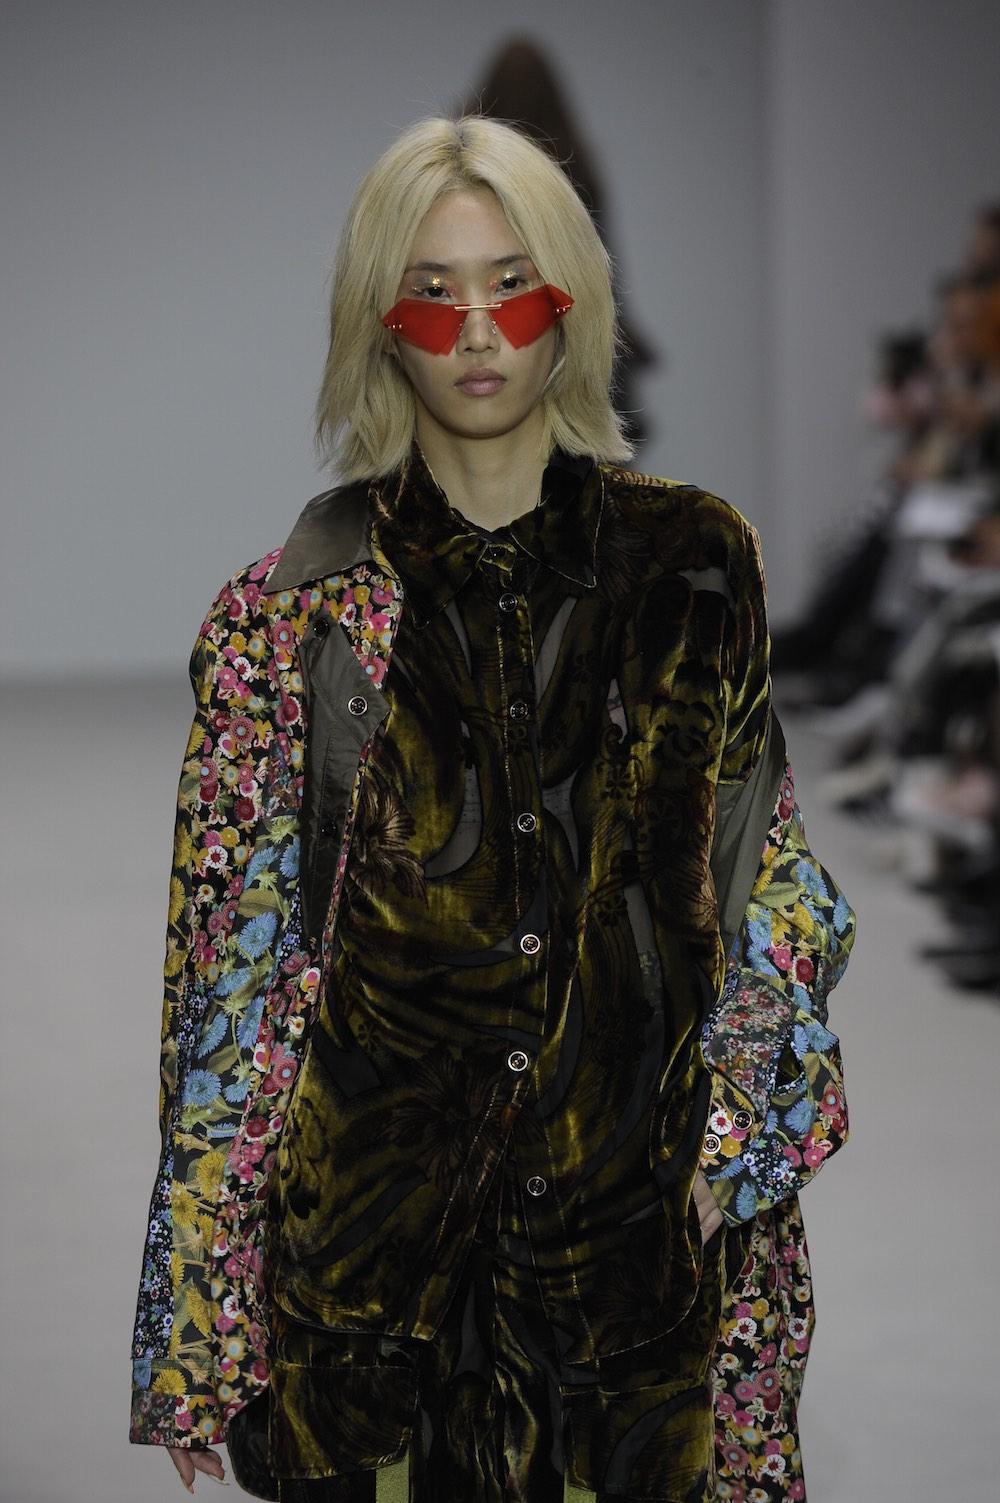 MA Fashion Design Technology Womenswear graduate Feiyi Shuai. Image by Roger Dean.